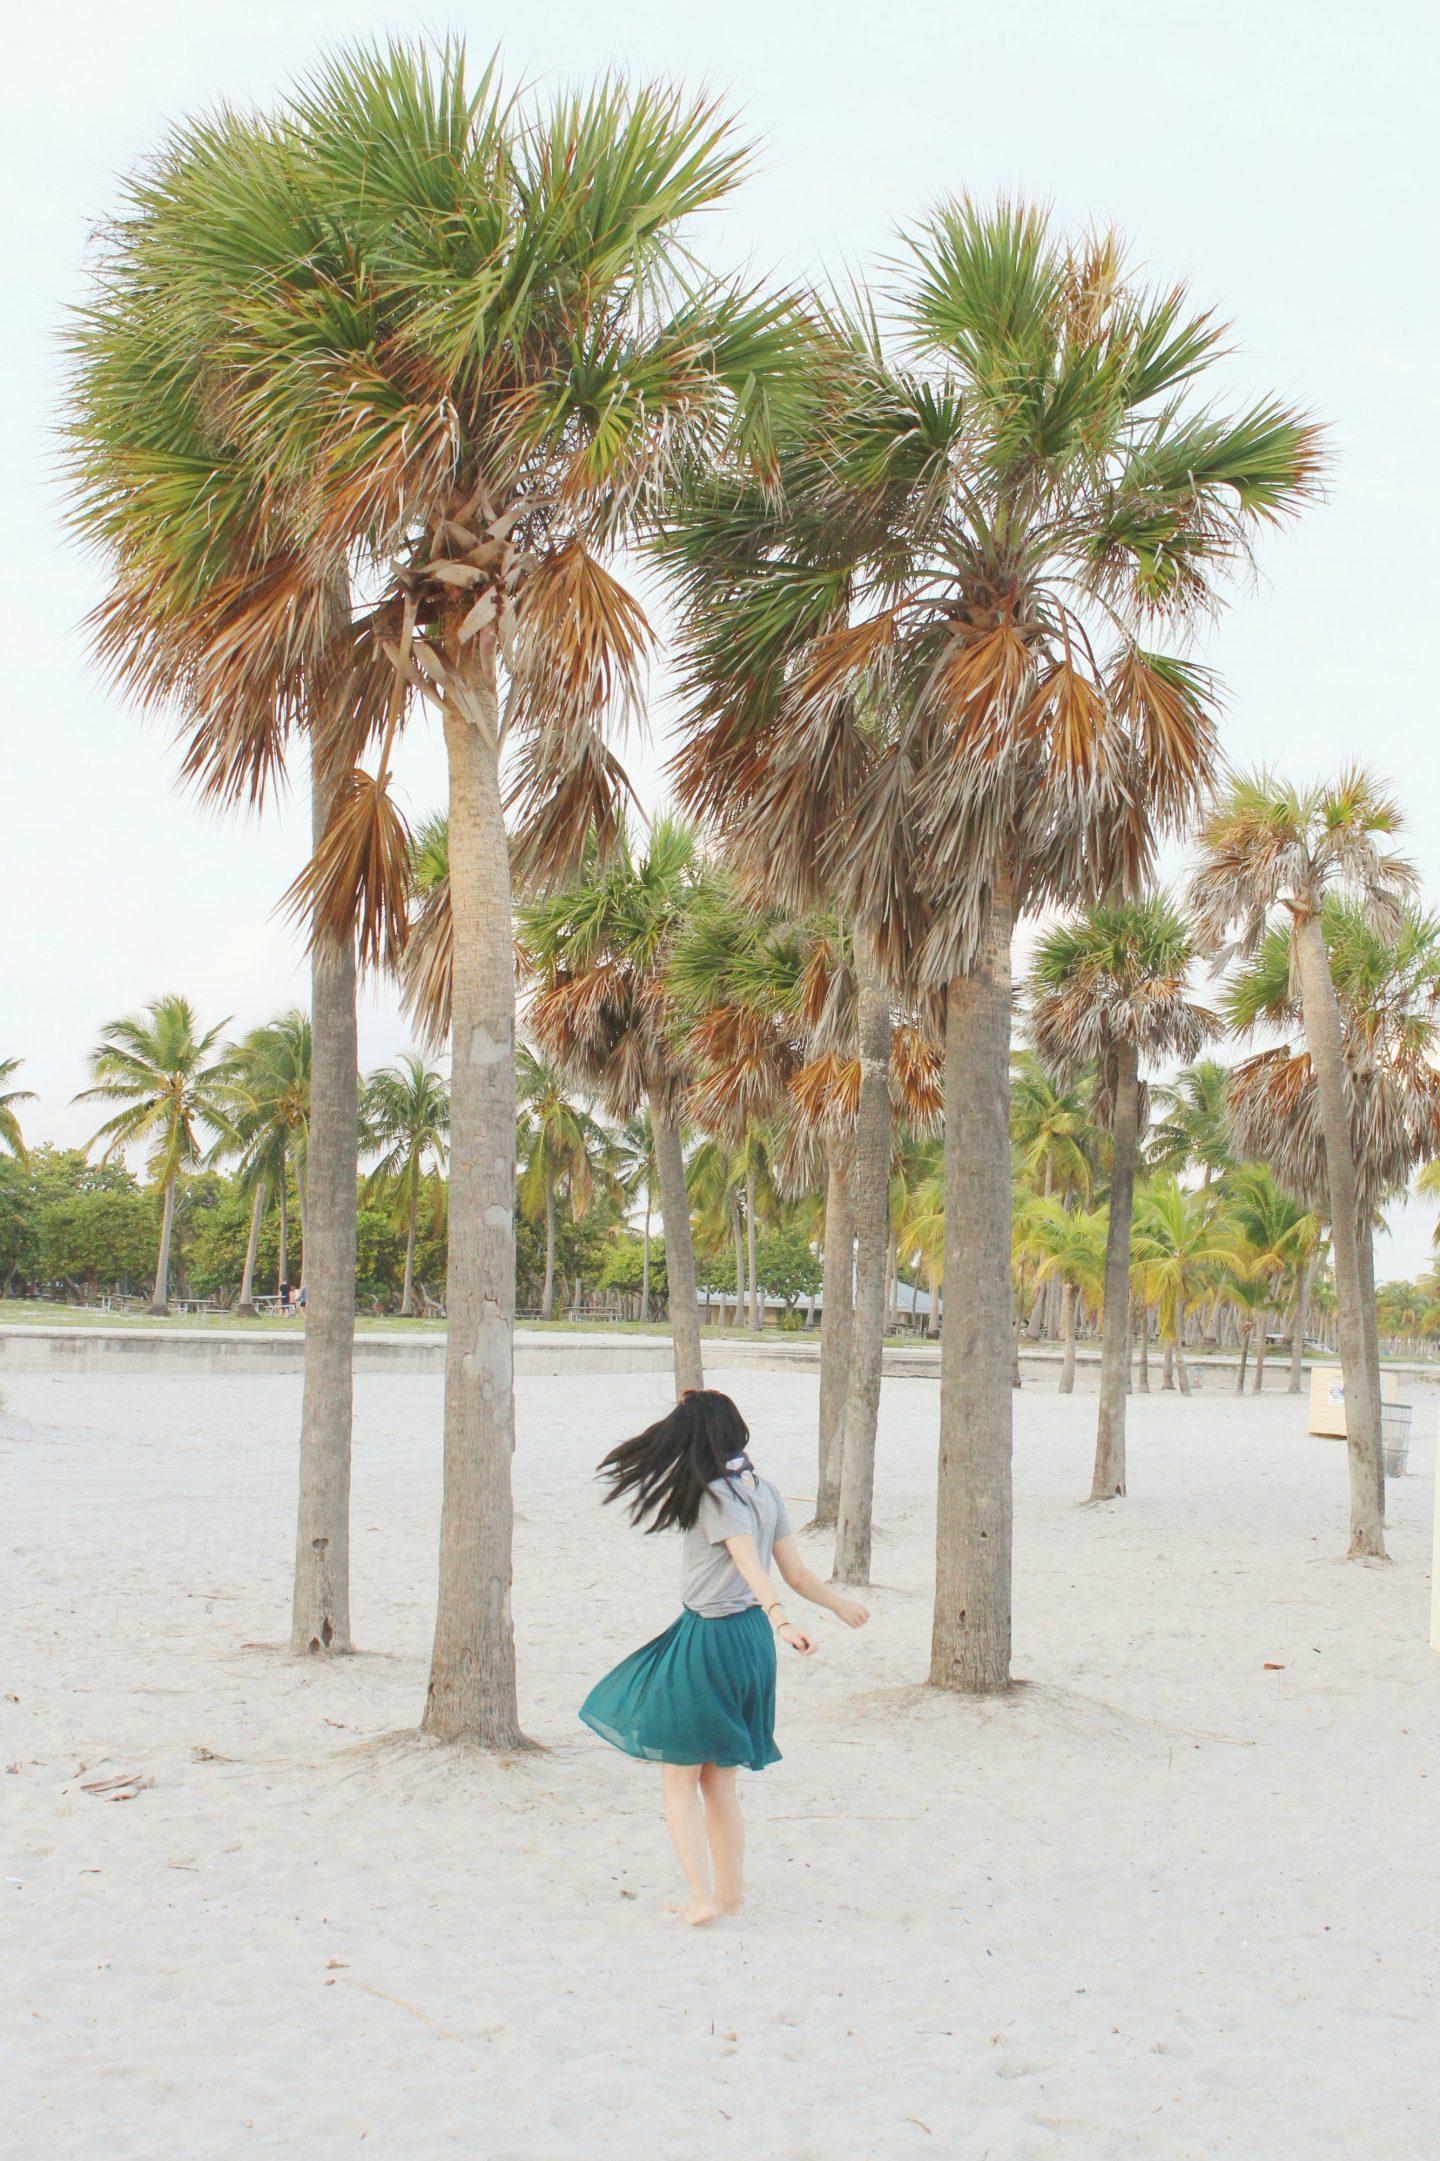 Miami travel guide key biscayne